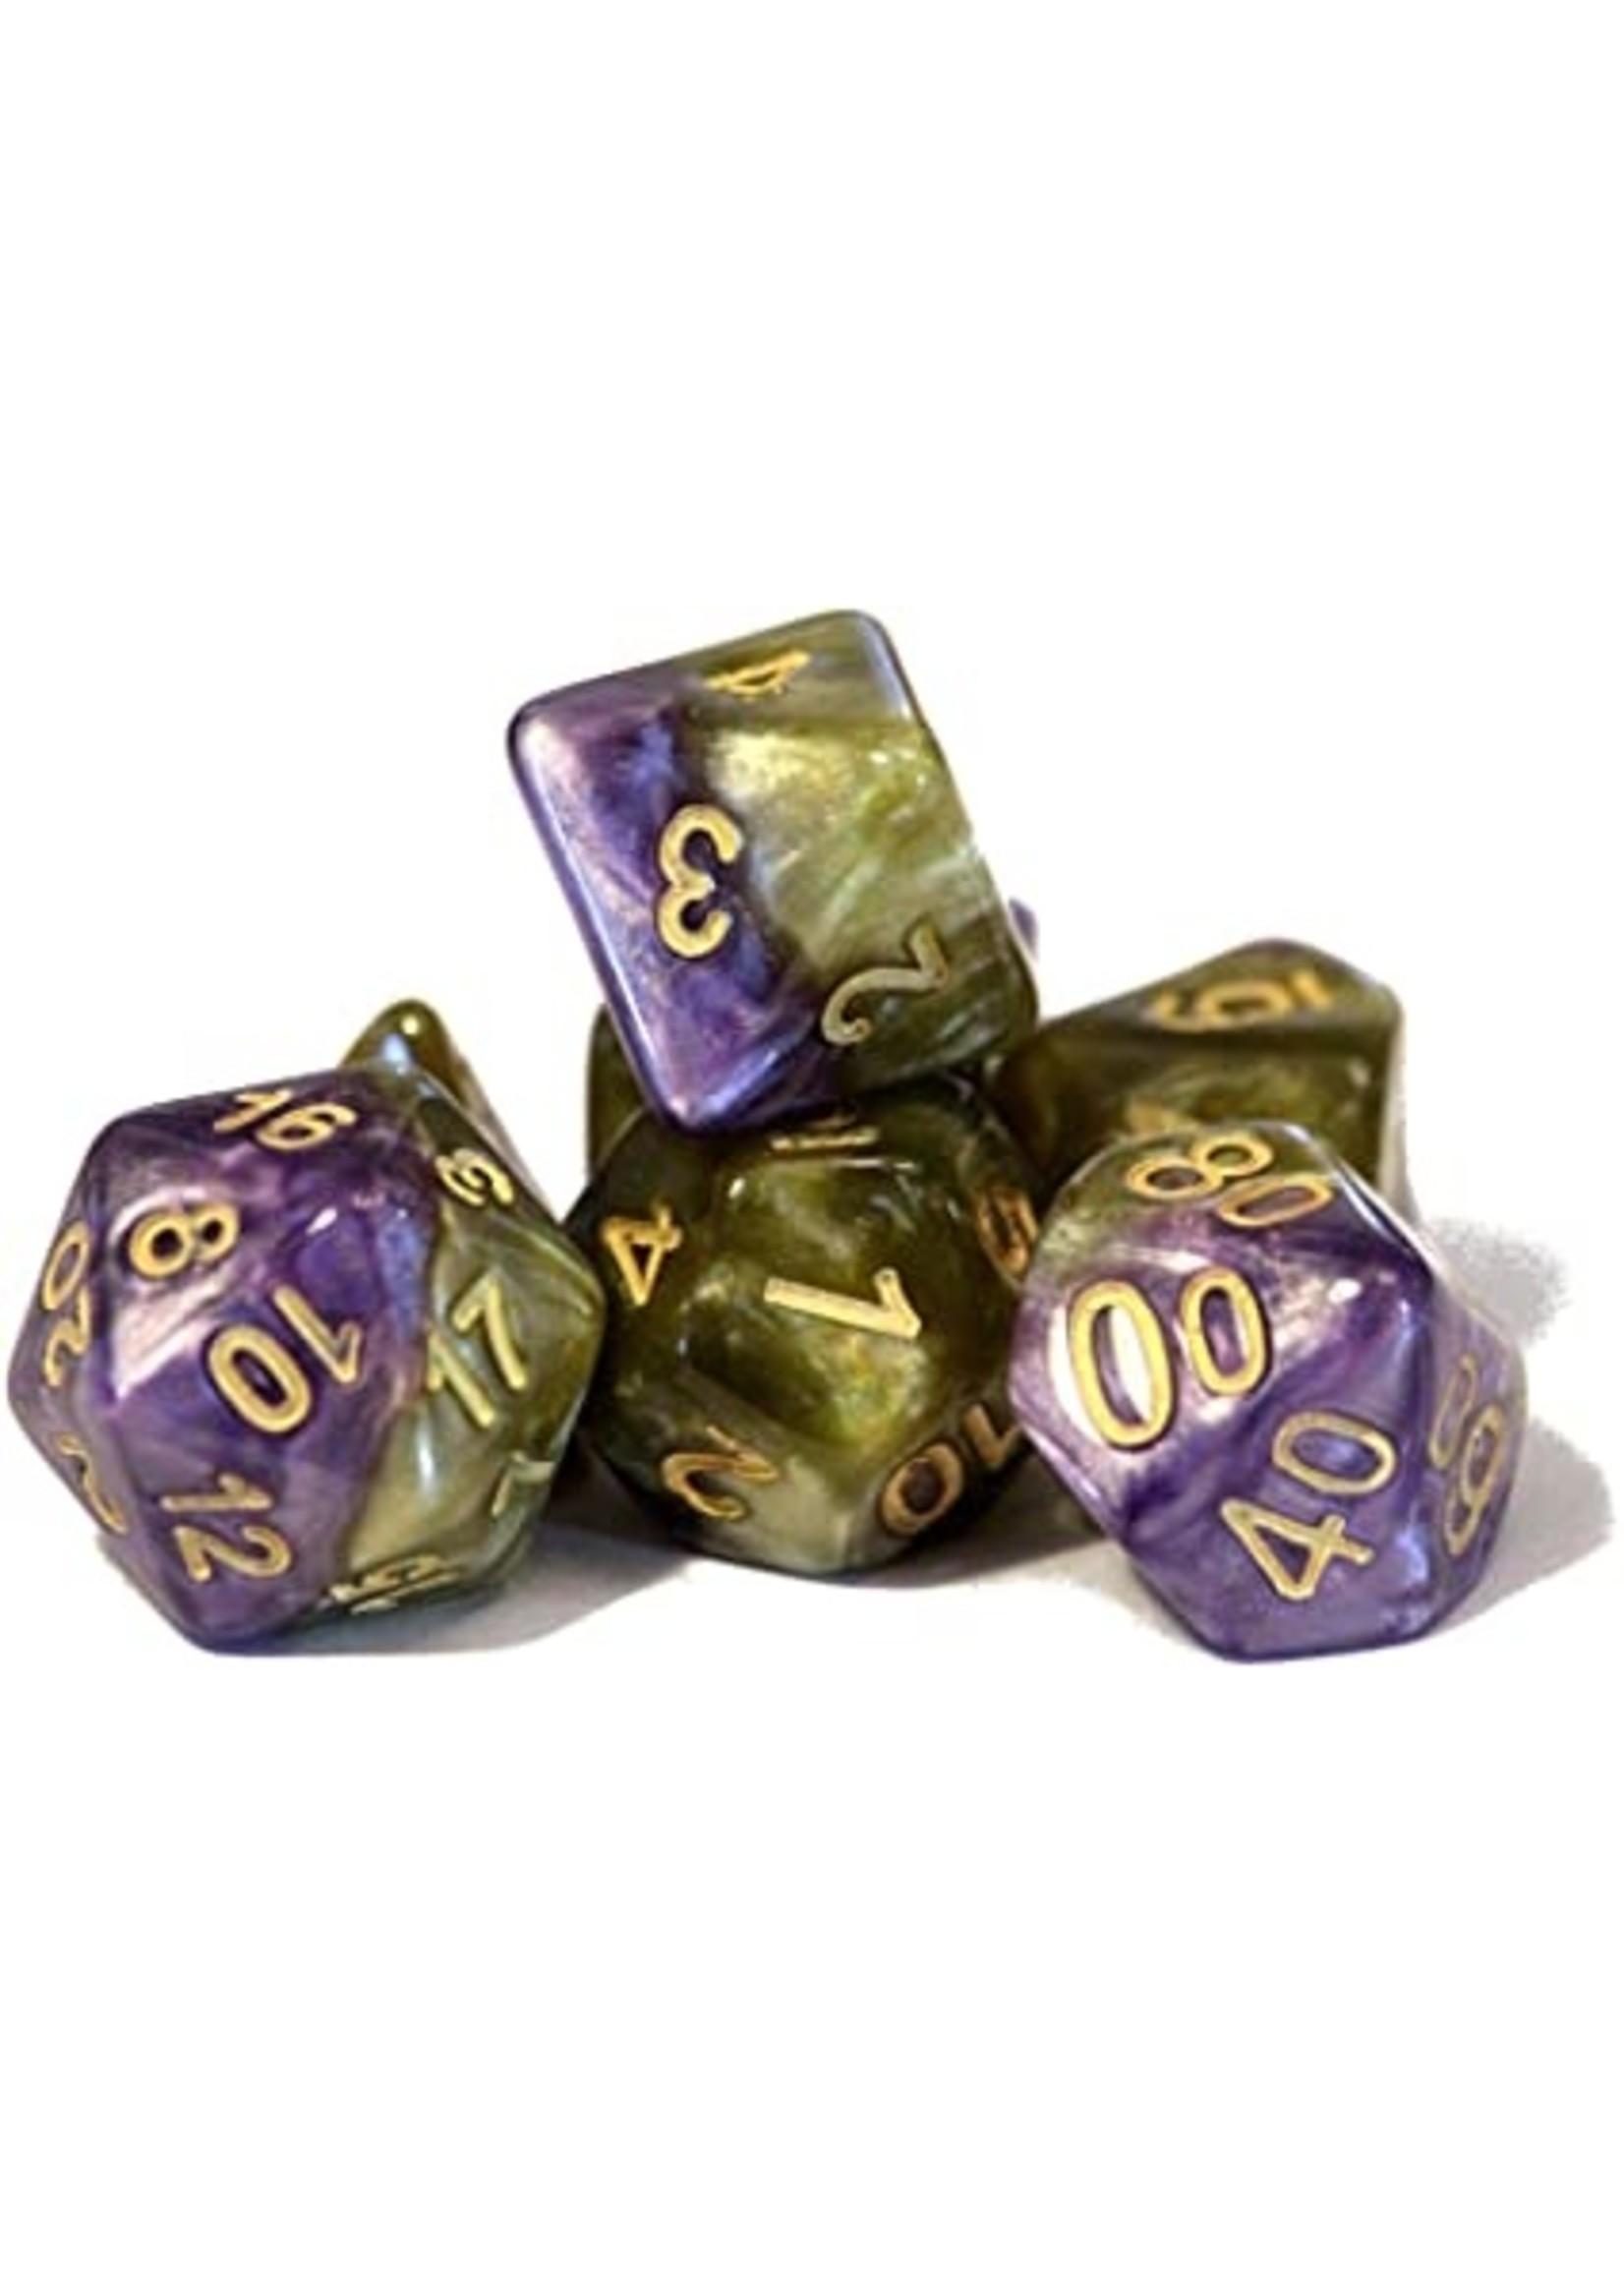 Halfsies Dice: Queen`s Dice -  (7 Polyhedral Dice Set)